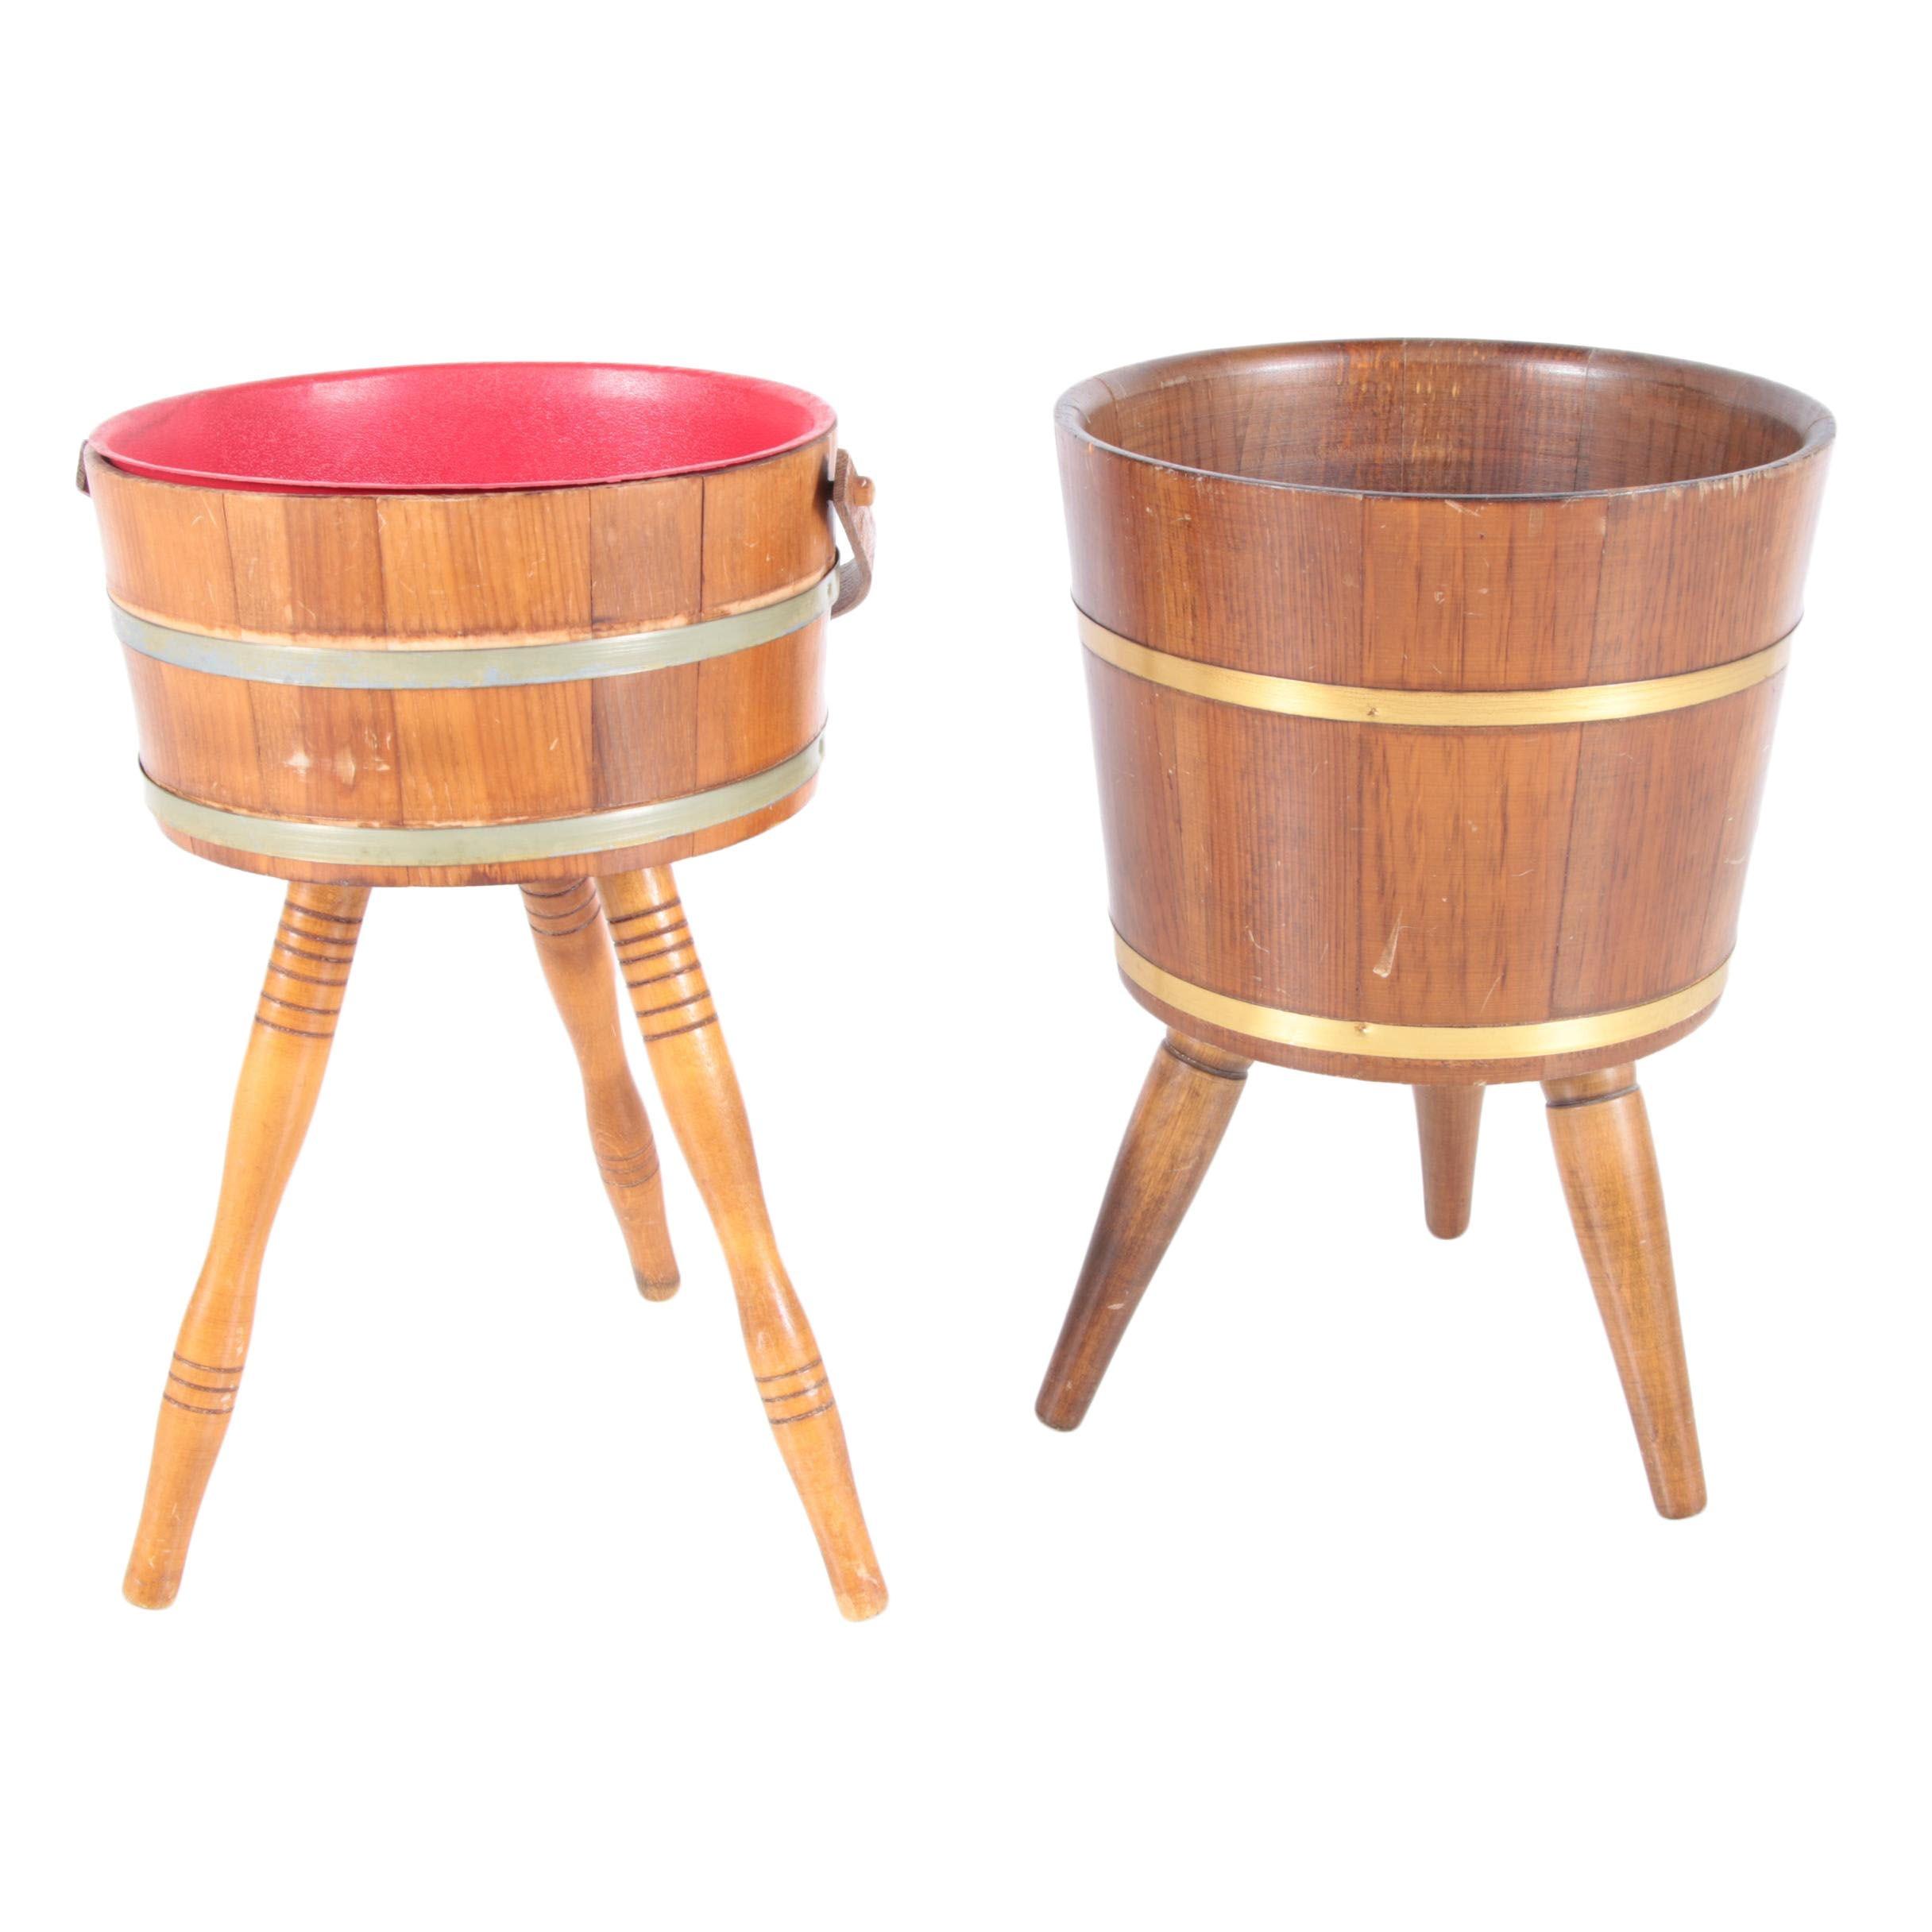 Two Vintage Sewing Bucket Barrels